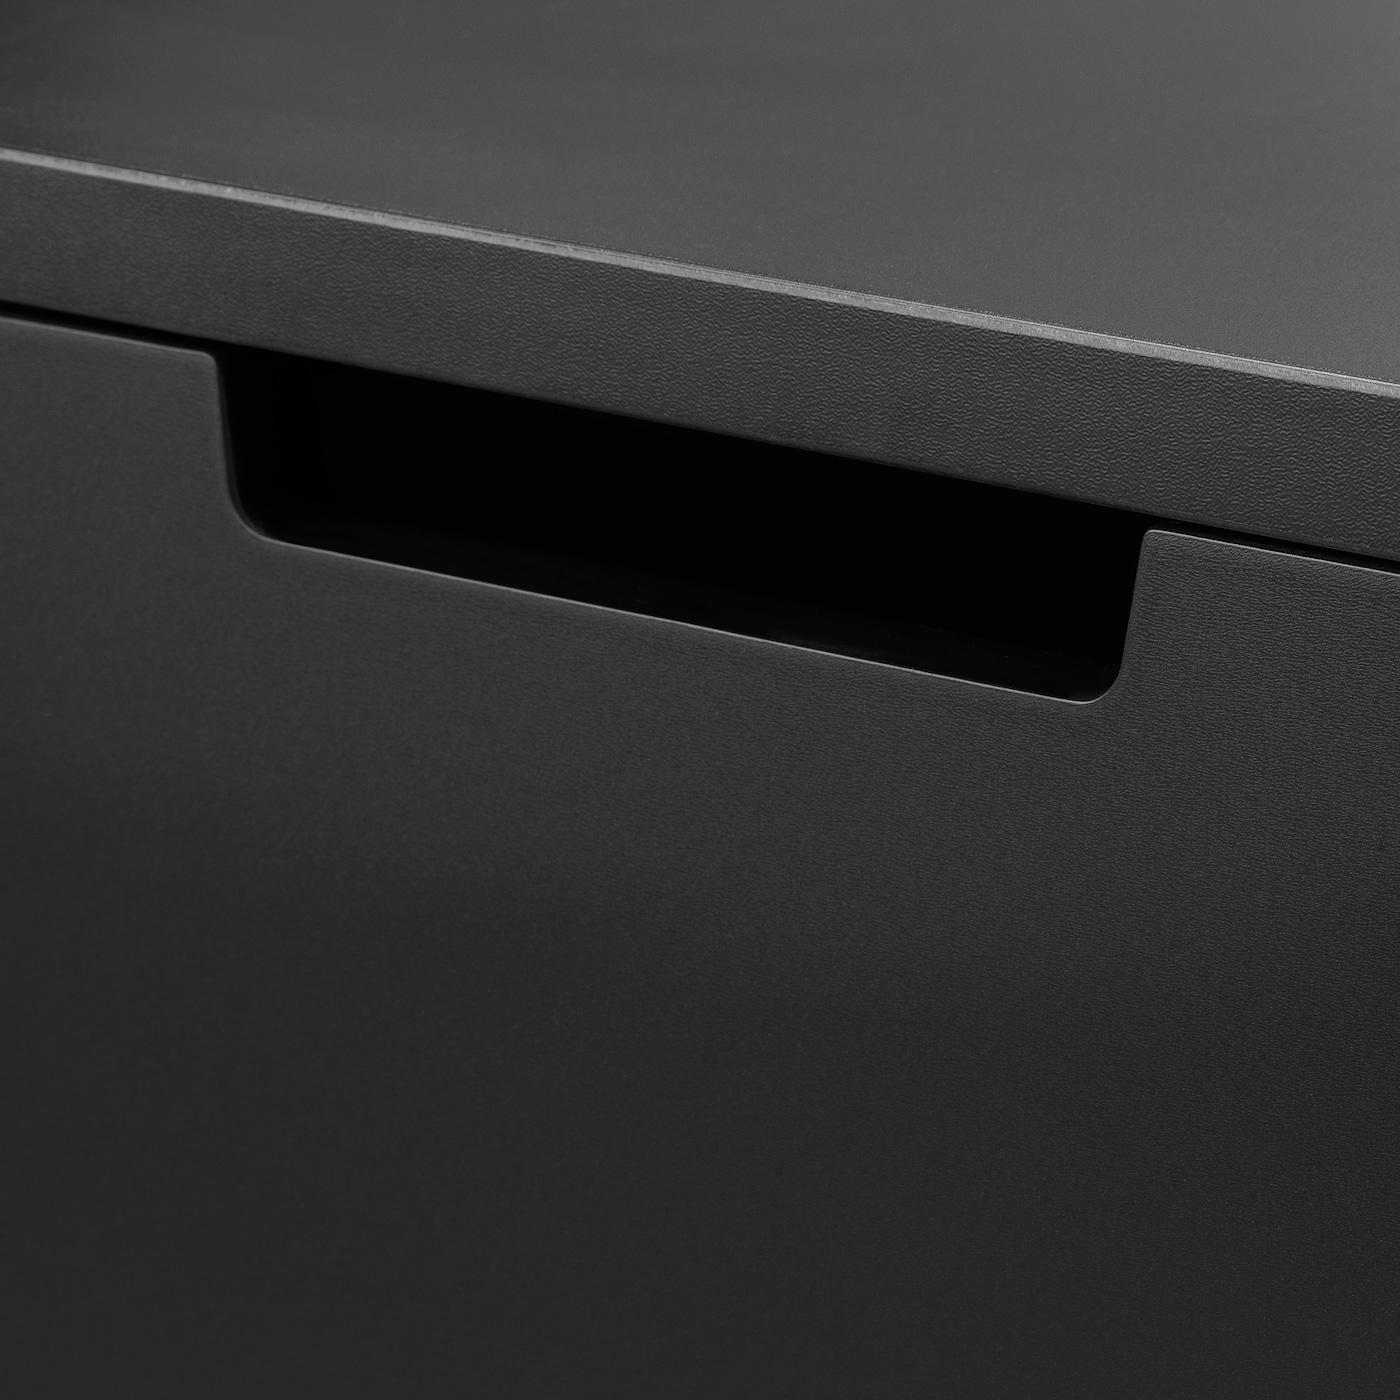 NORDLI Chest of 3 drawers, anthracite, 40x76 cm